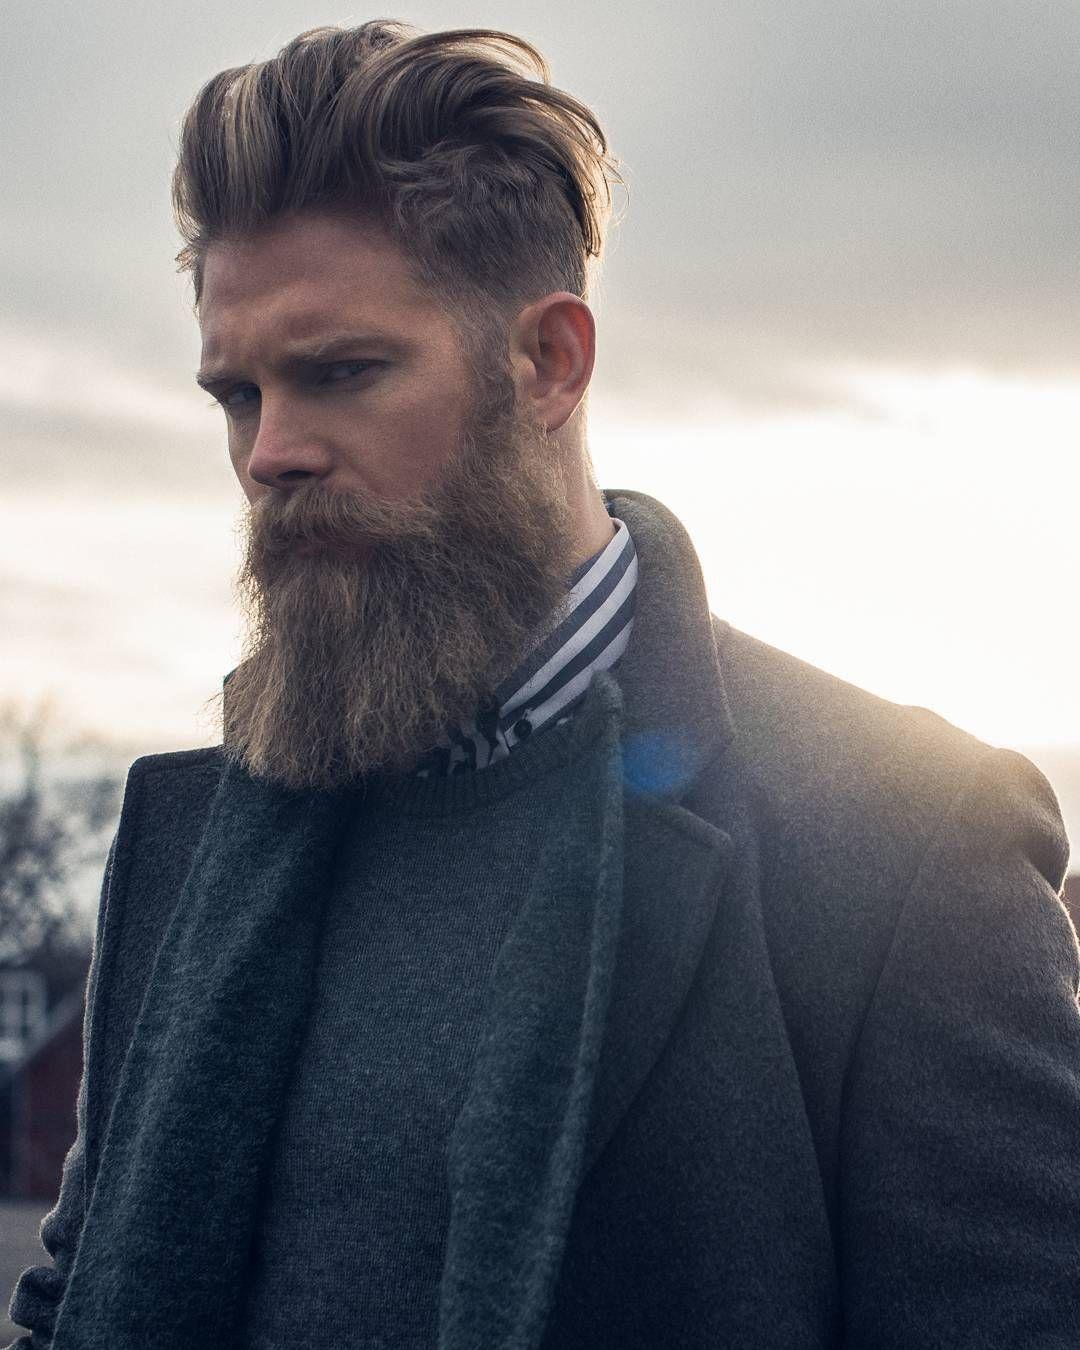 josh mario john thick blond beard beards bearded man men blonde